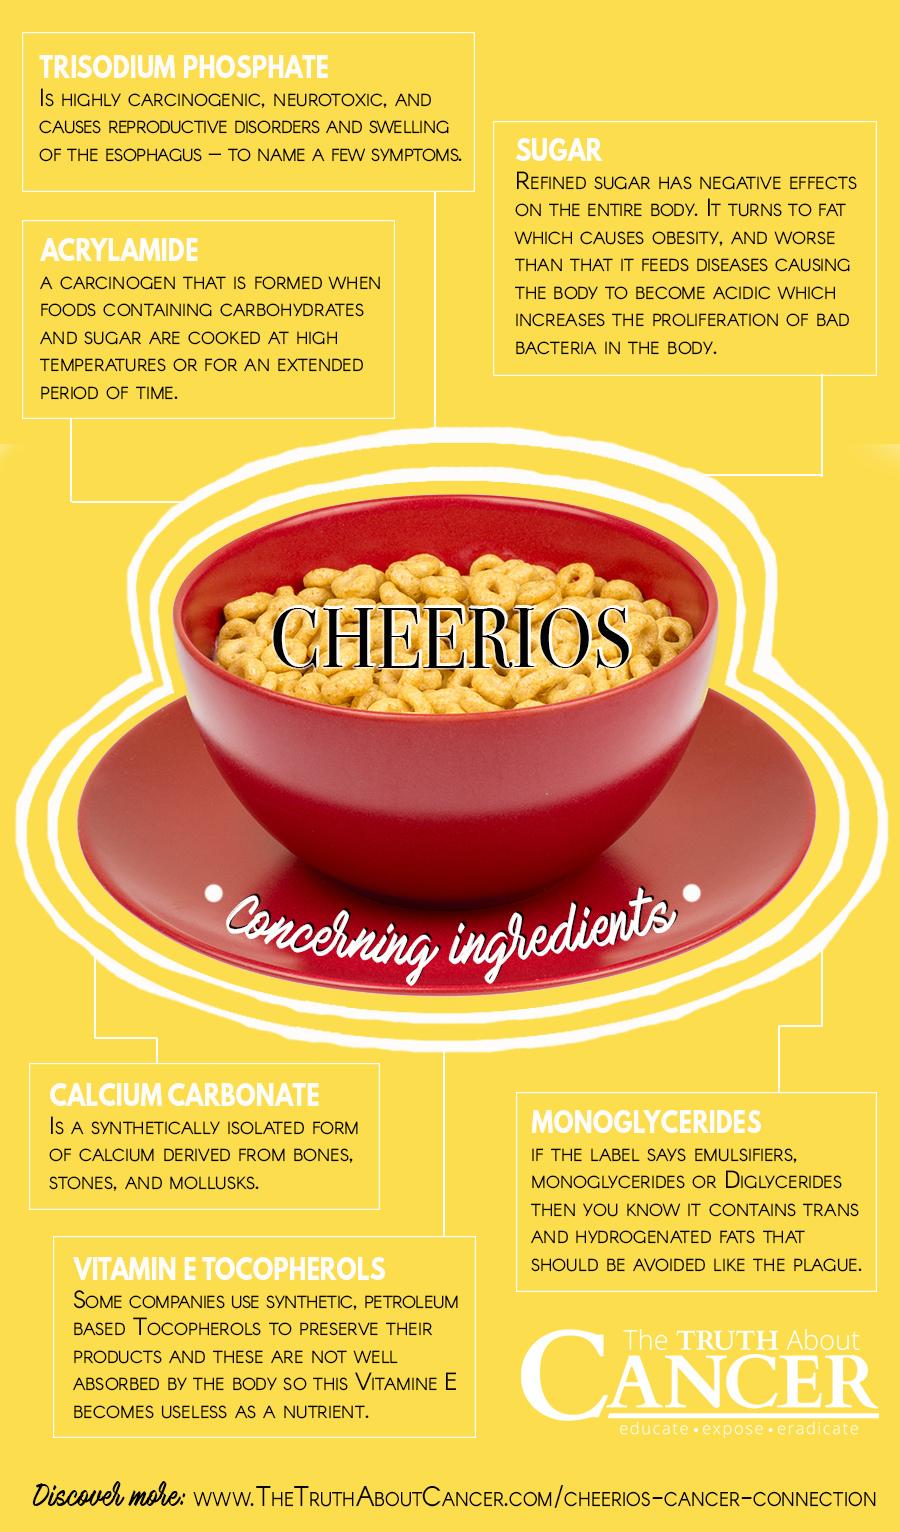 Cheerios Concerning Ingredients